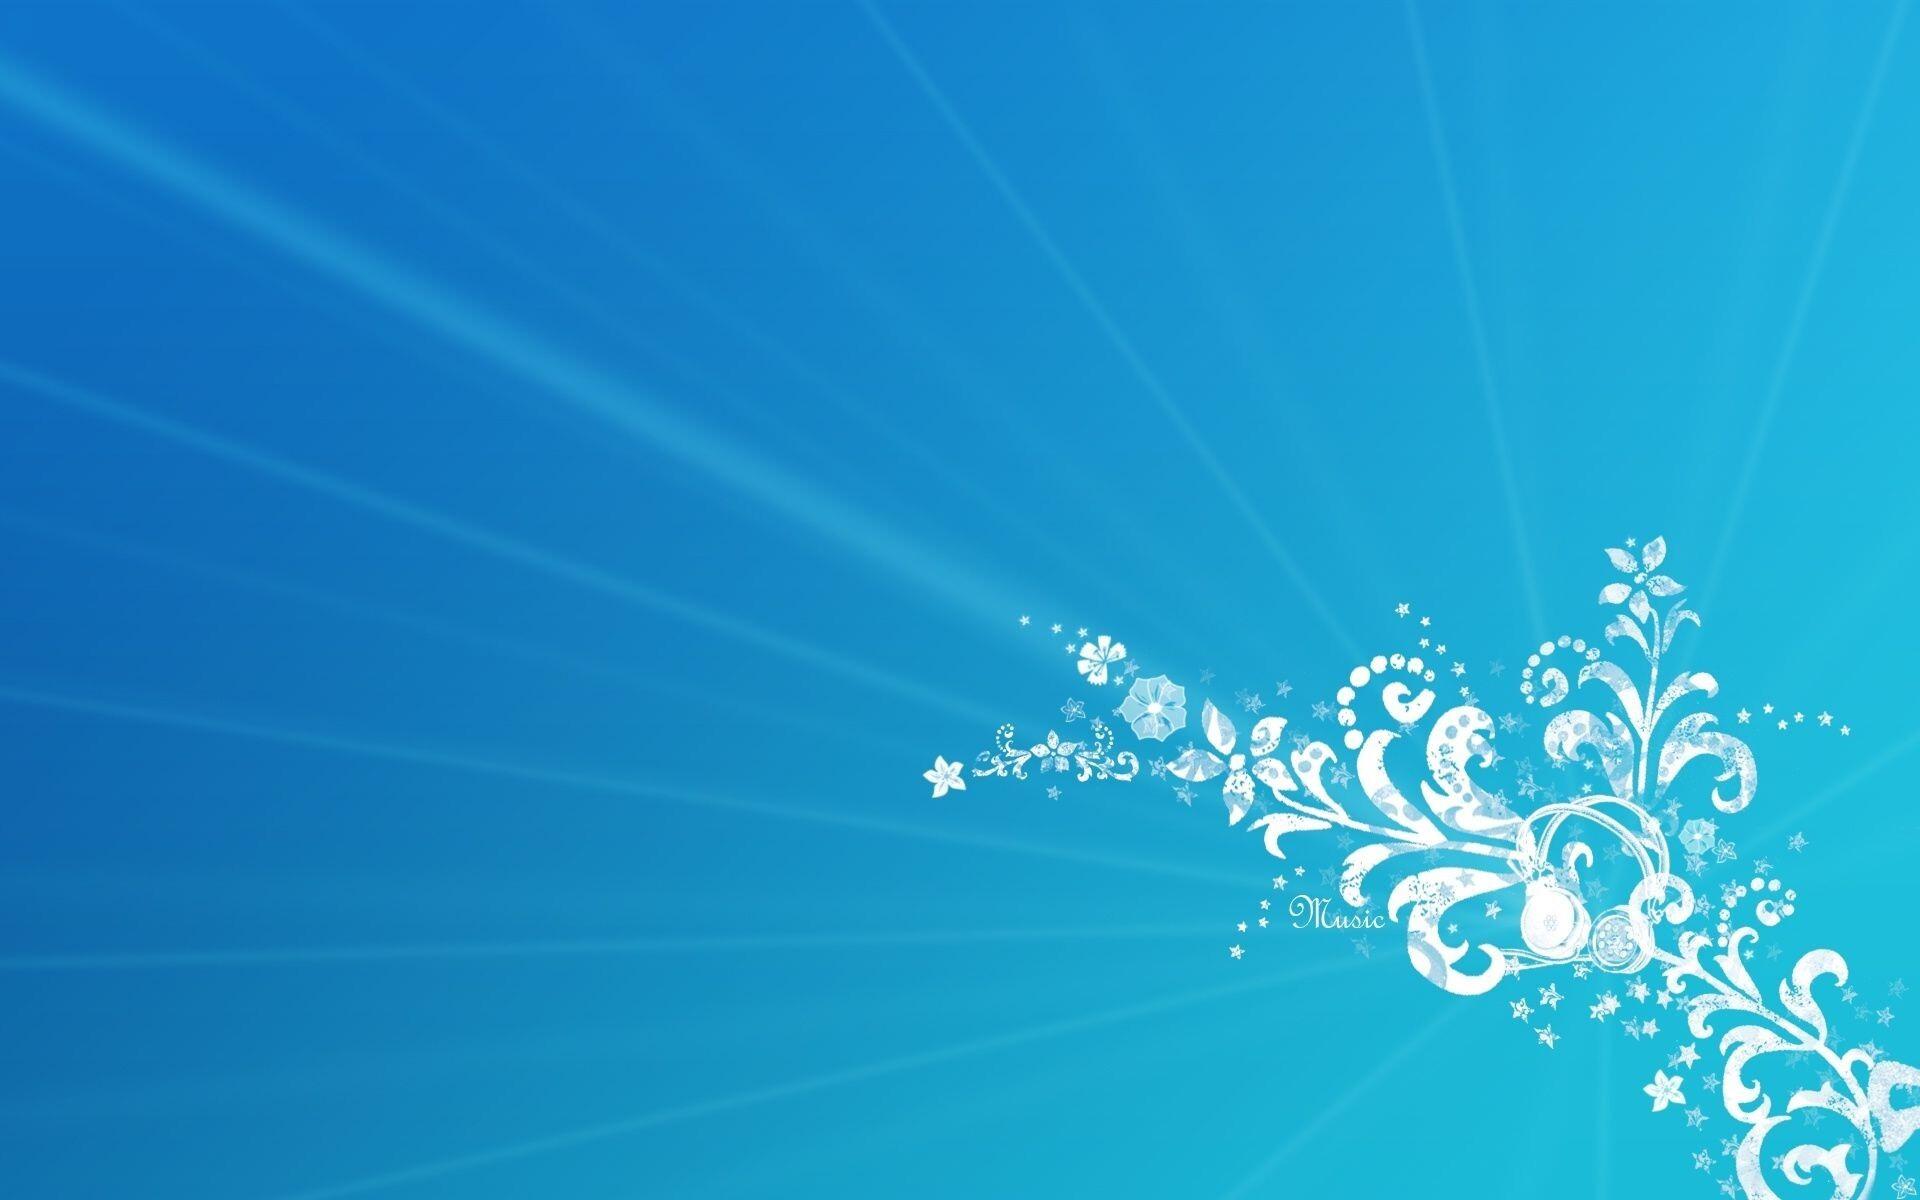 Best Wallpaper Blue Music - Blue_Music_Flower_Corner_Design_Wallpapers  Collection_73813.jpg